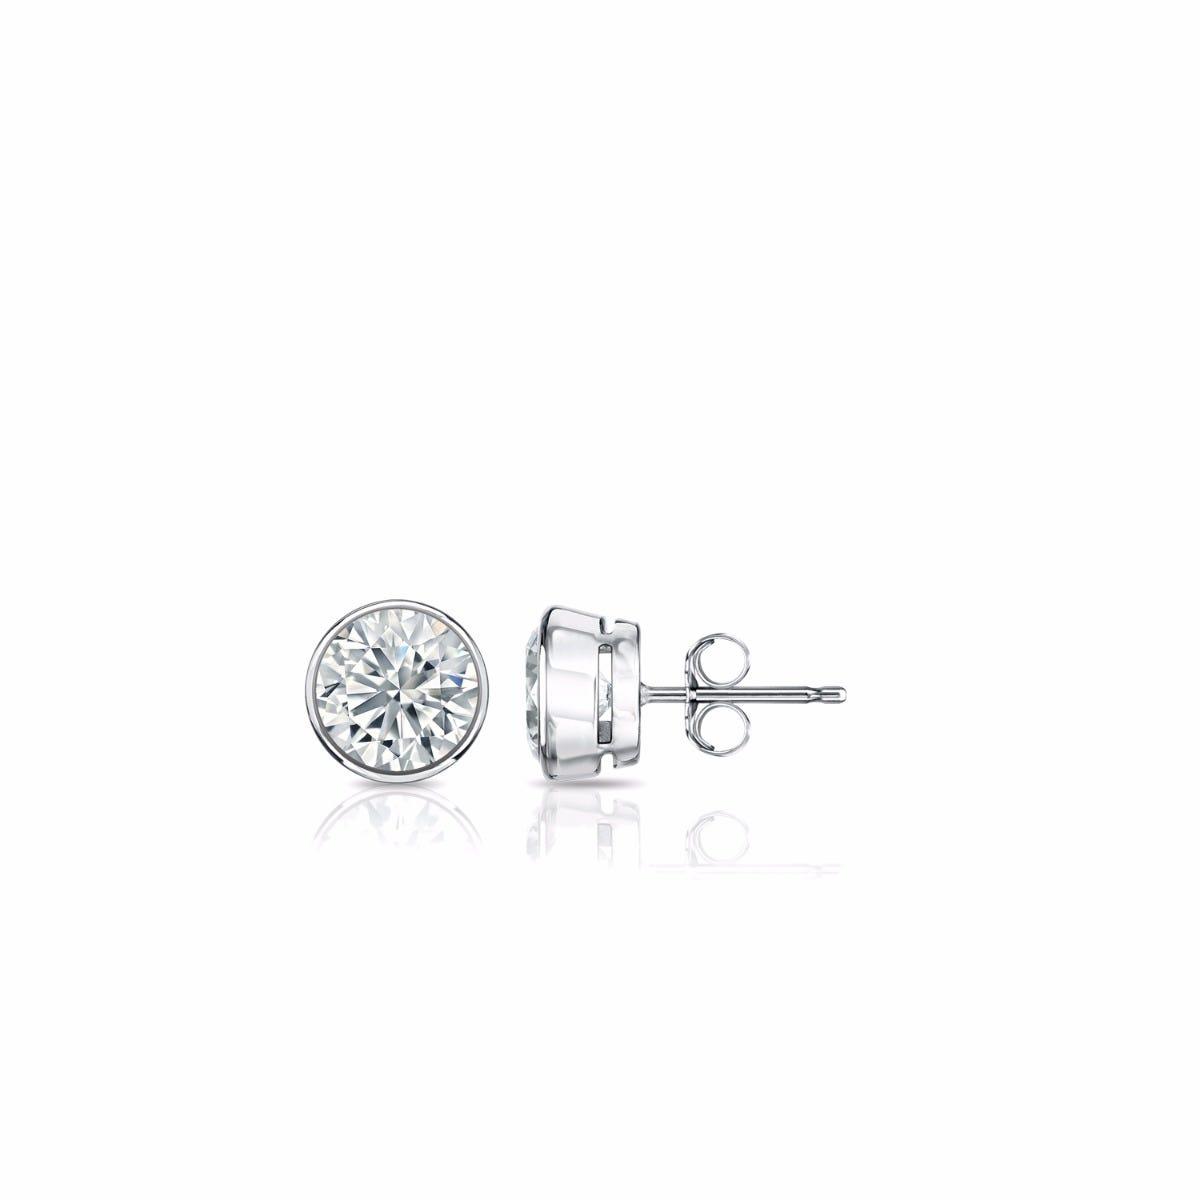 Bezel-Set Round 1/6ctw. Diamond Solitaire Stud Earrings (IJ, I1) in Platinum